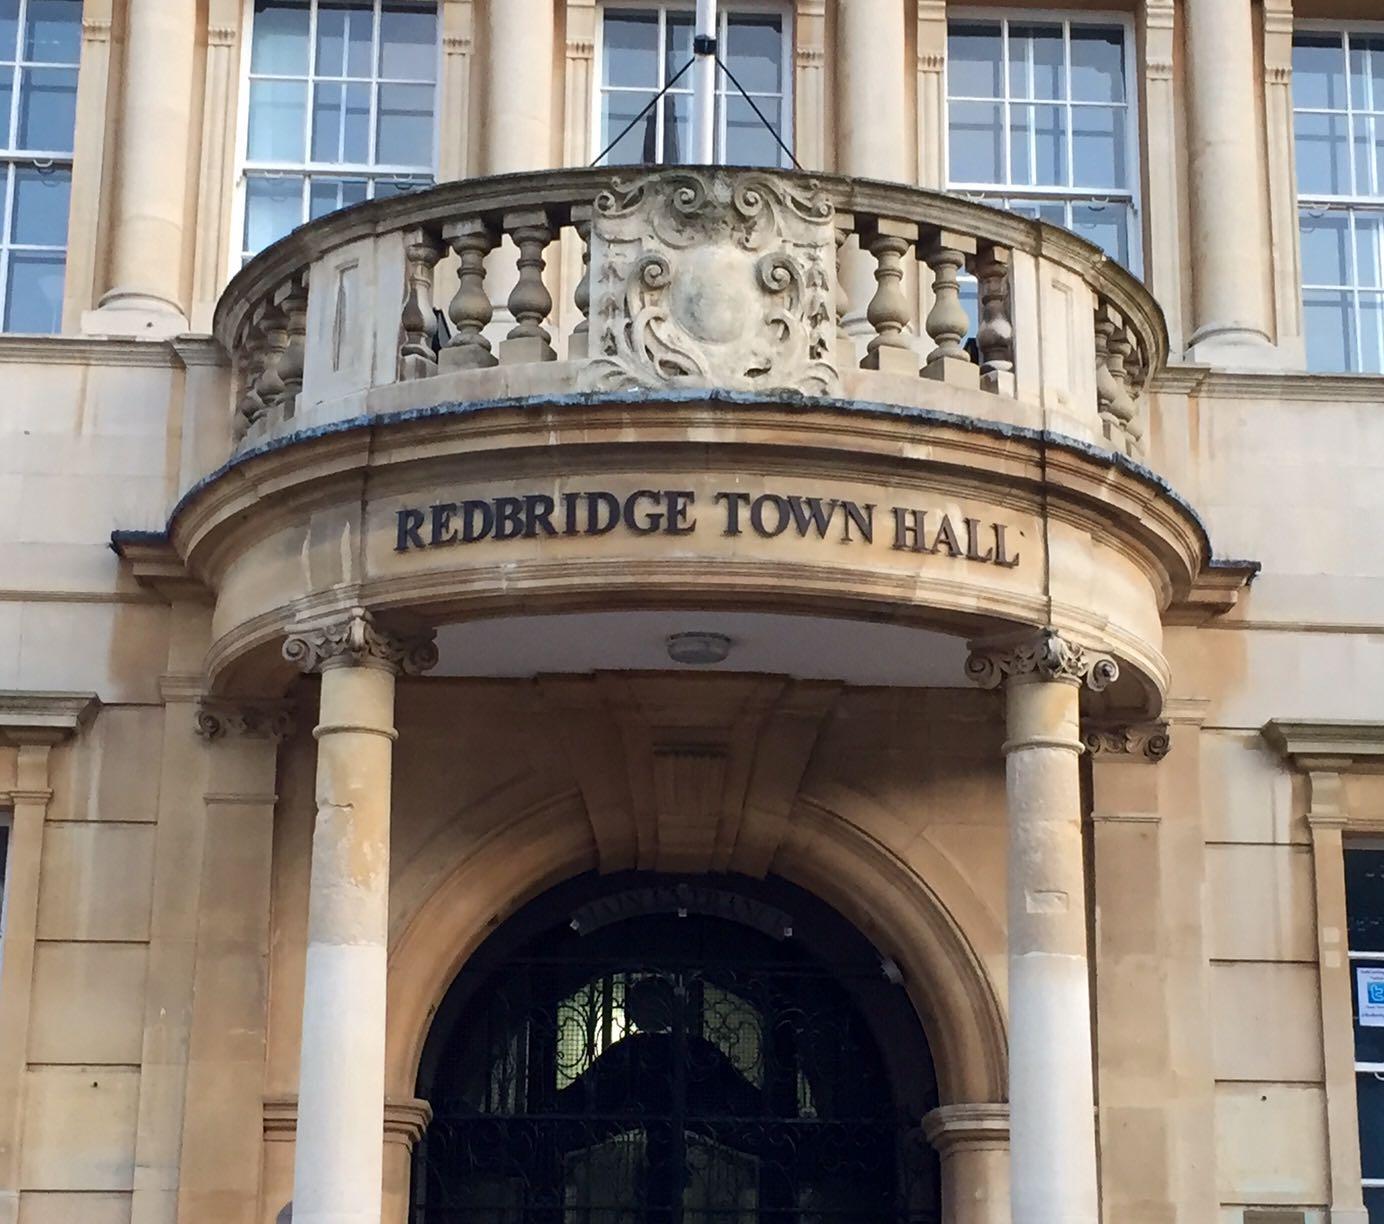 Redbridge Town Hall (c) London Property Licensing 2019